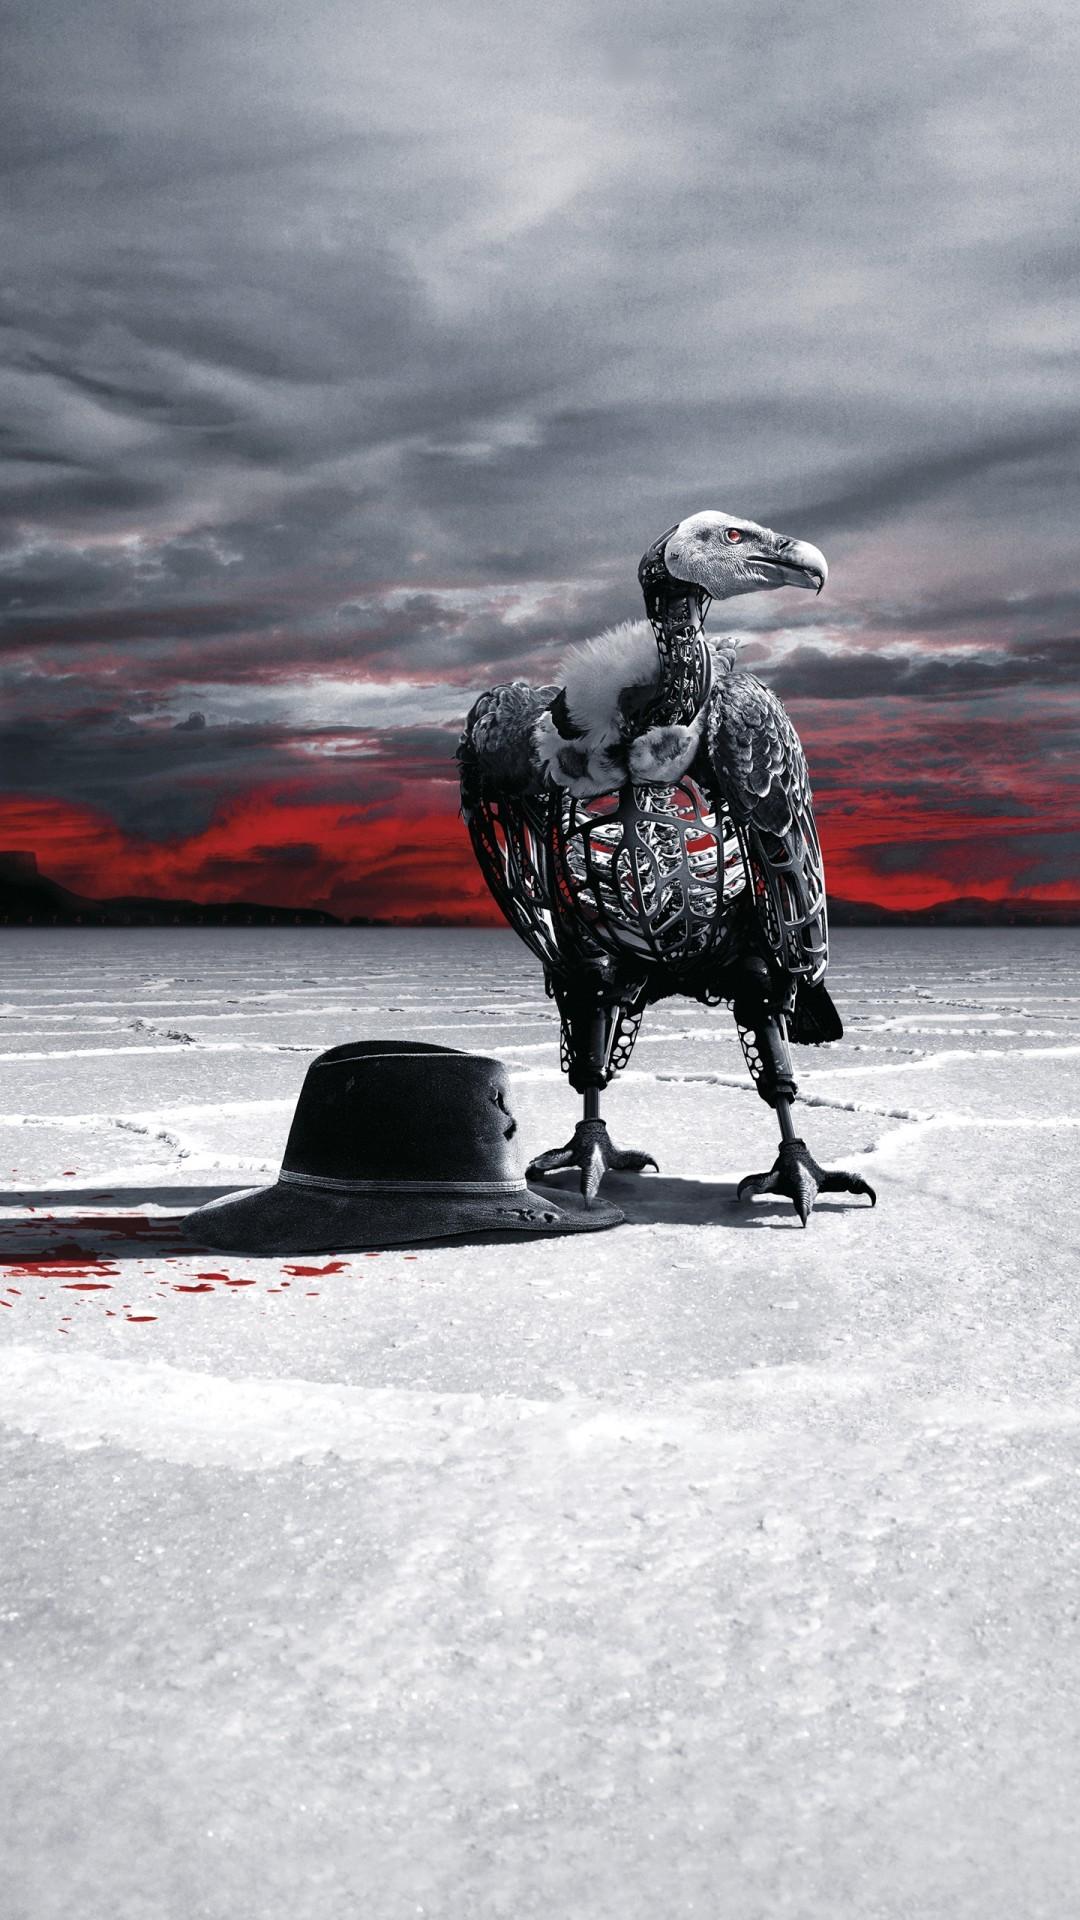 Free Westworld Season 2 phone wallpaper by brendel7